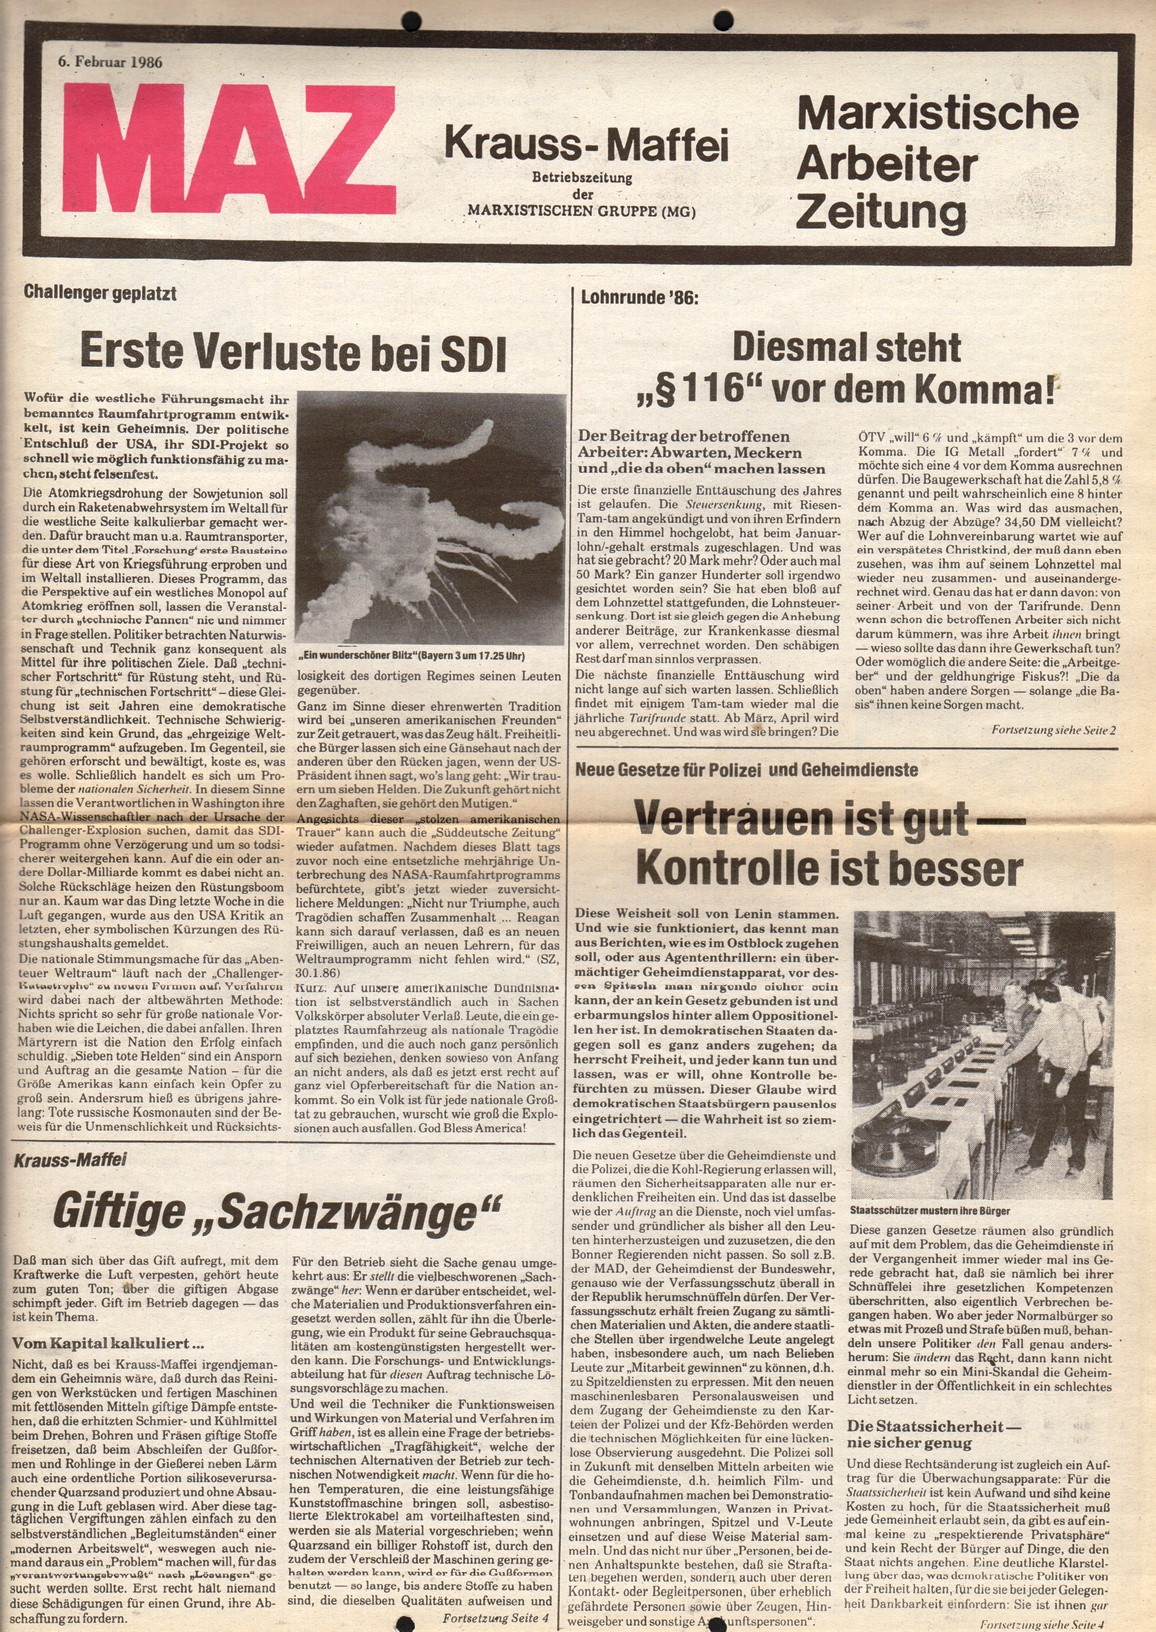 Muenchen_MG_MAZ_Krauss_Maffei_19860206_01